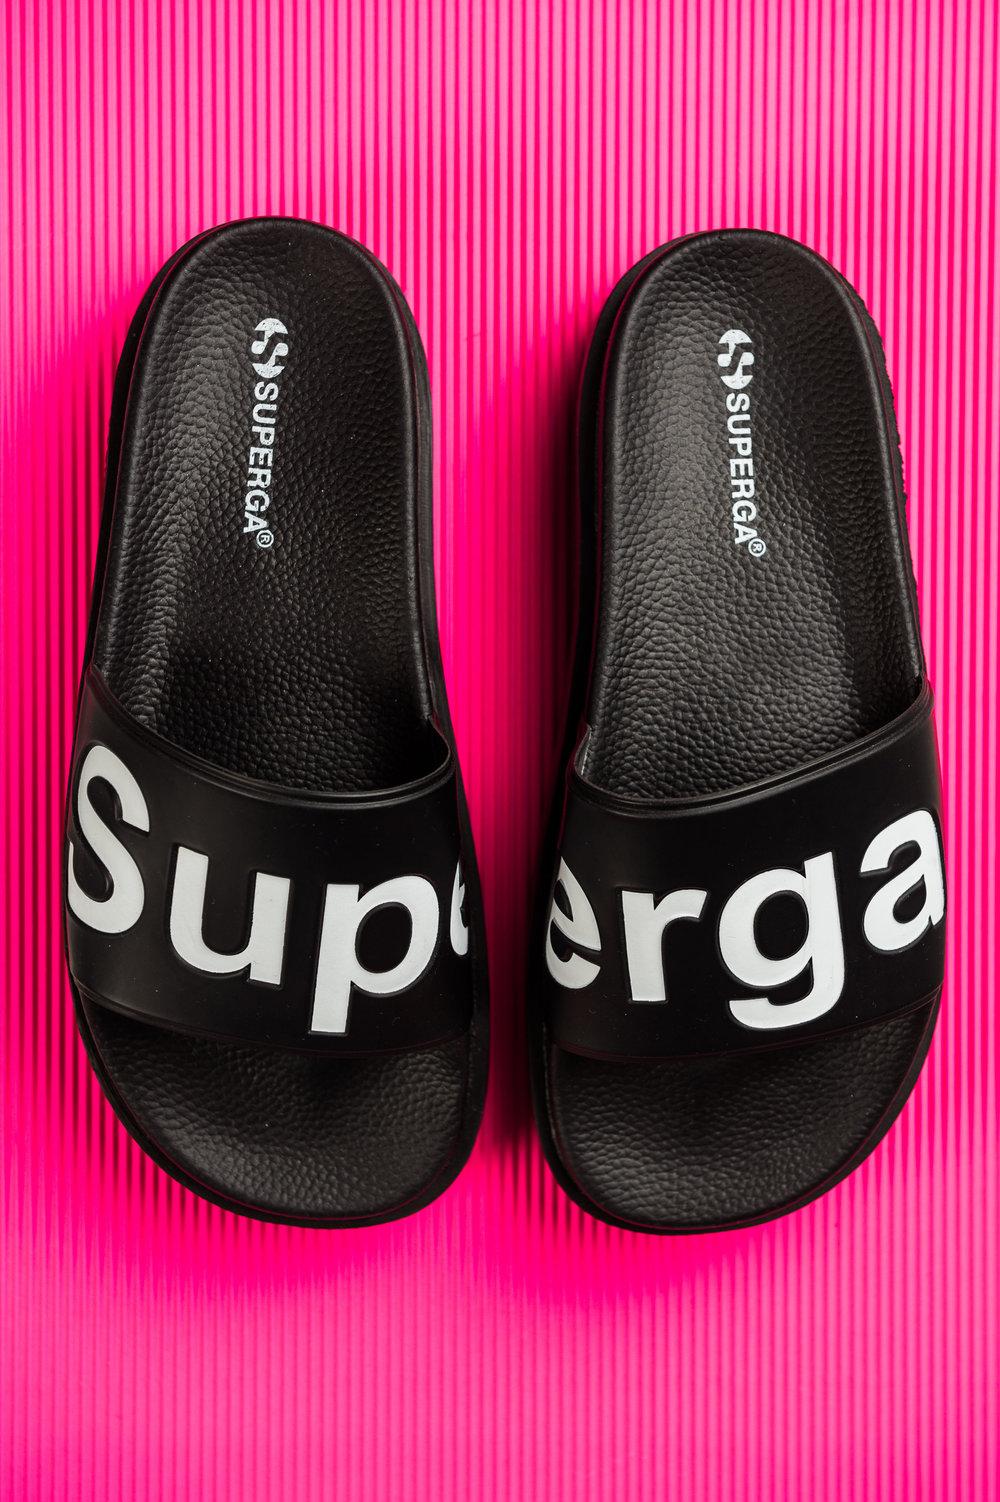 181002-Superga-2ndShoot-023 (1).jpg